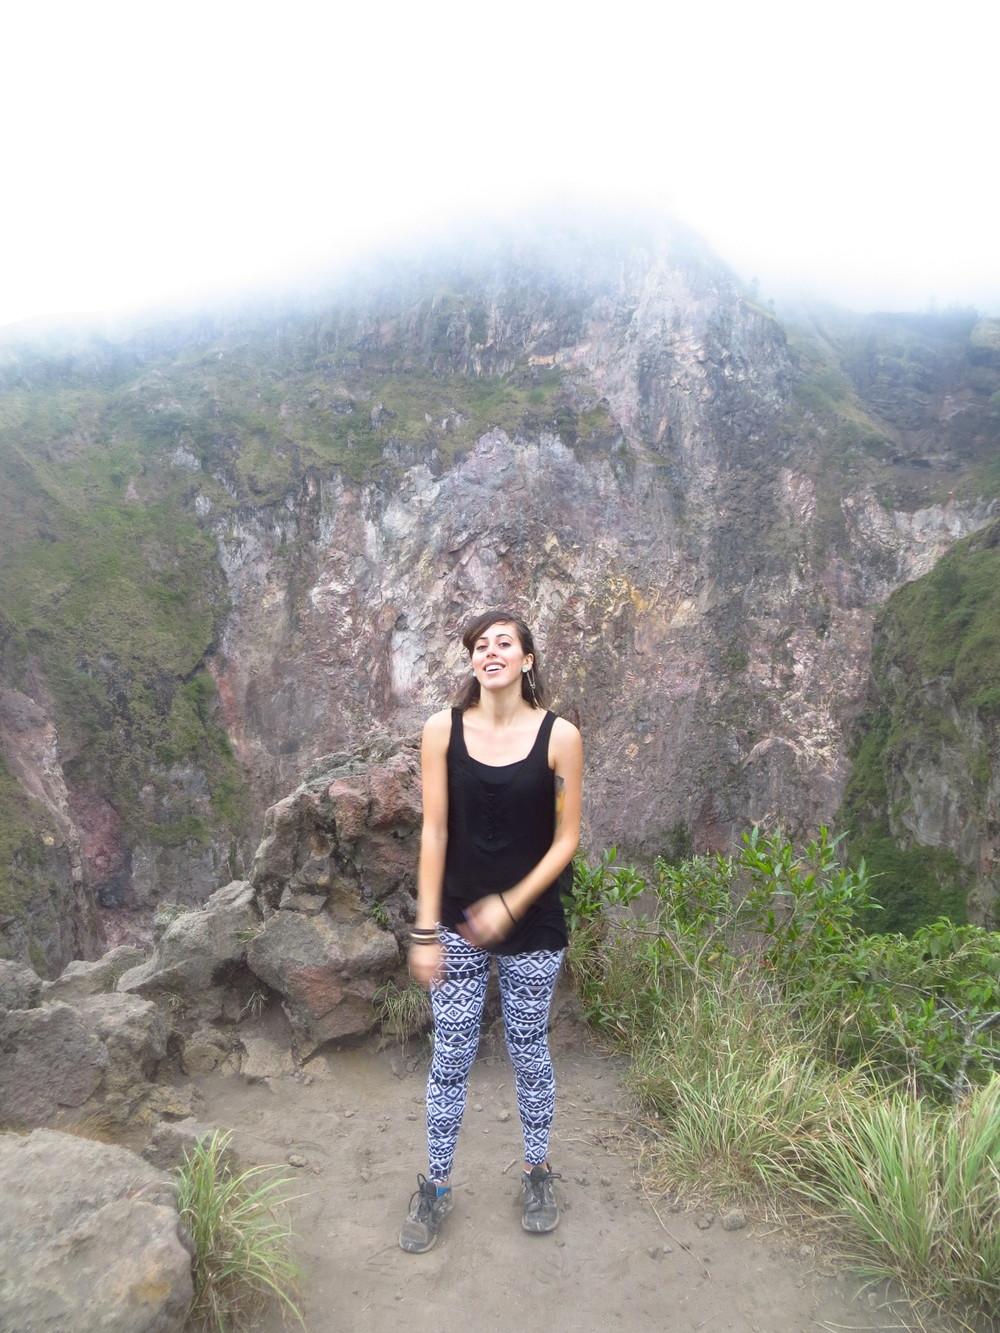 Bali Bliss - Mount Batur Hike